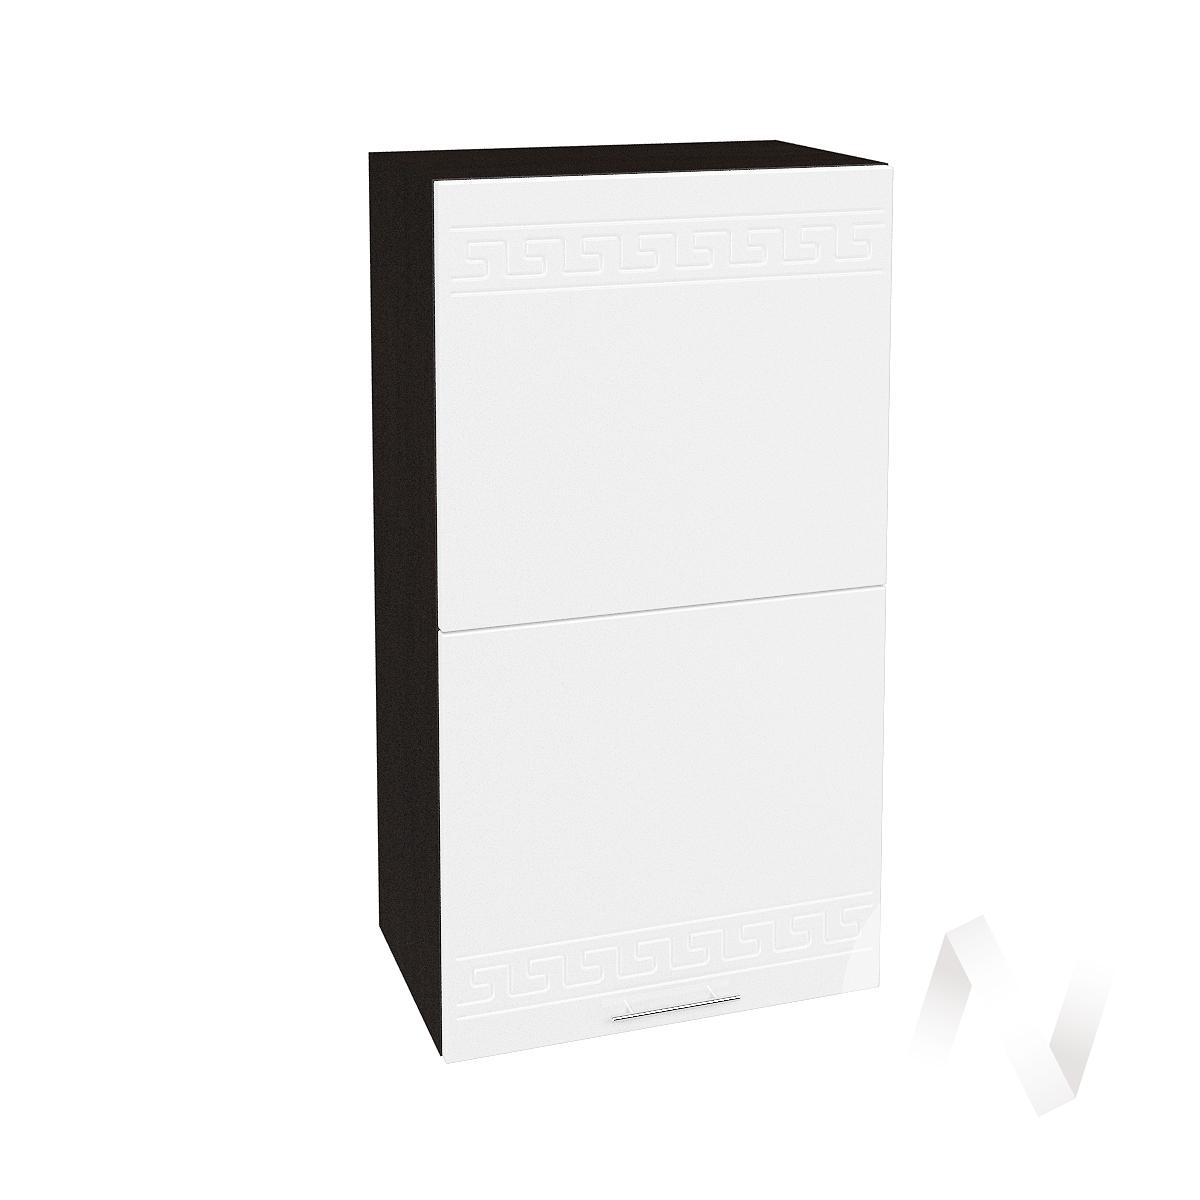 "Кухня ""Греция"": Шкаф верхний горизонтальный 502, ШВГ 502 (белый металлик/корпус венге)"